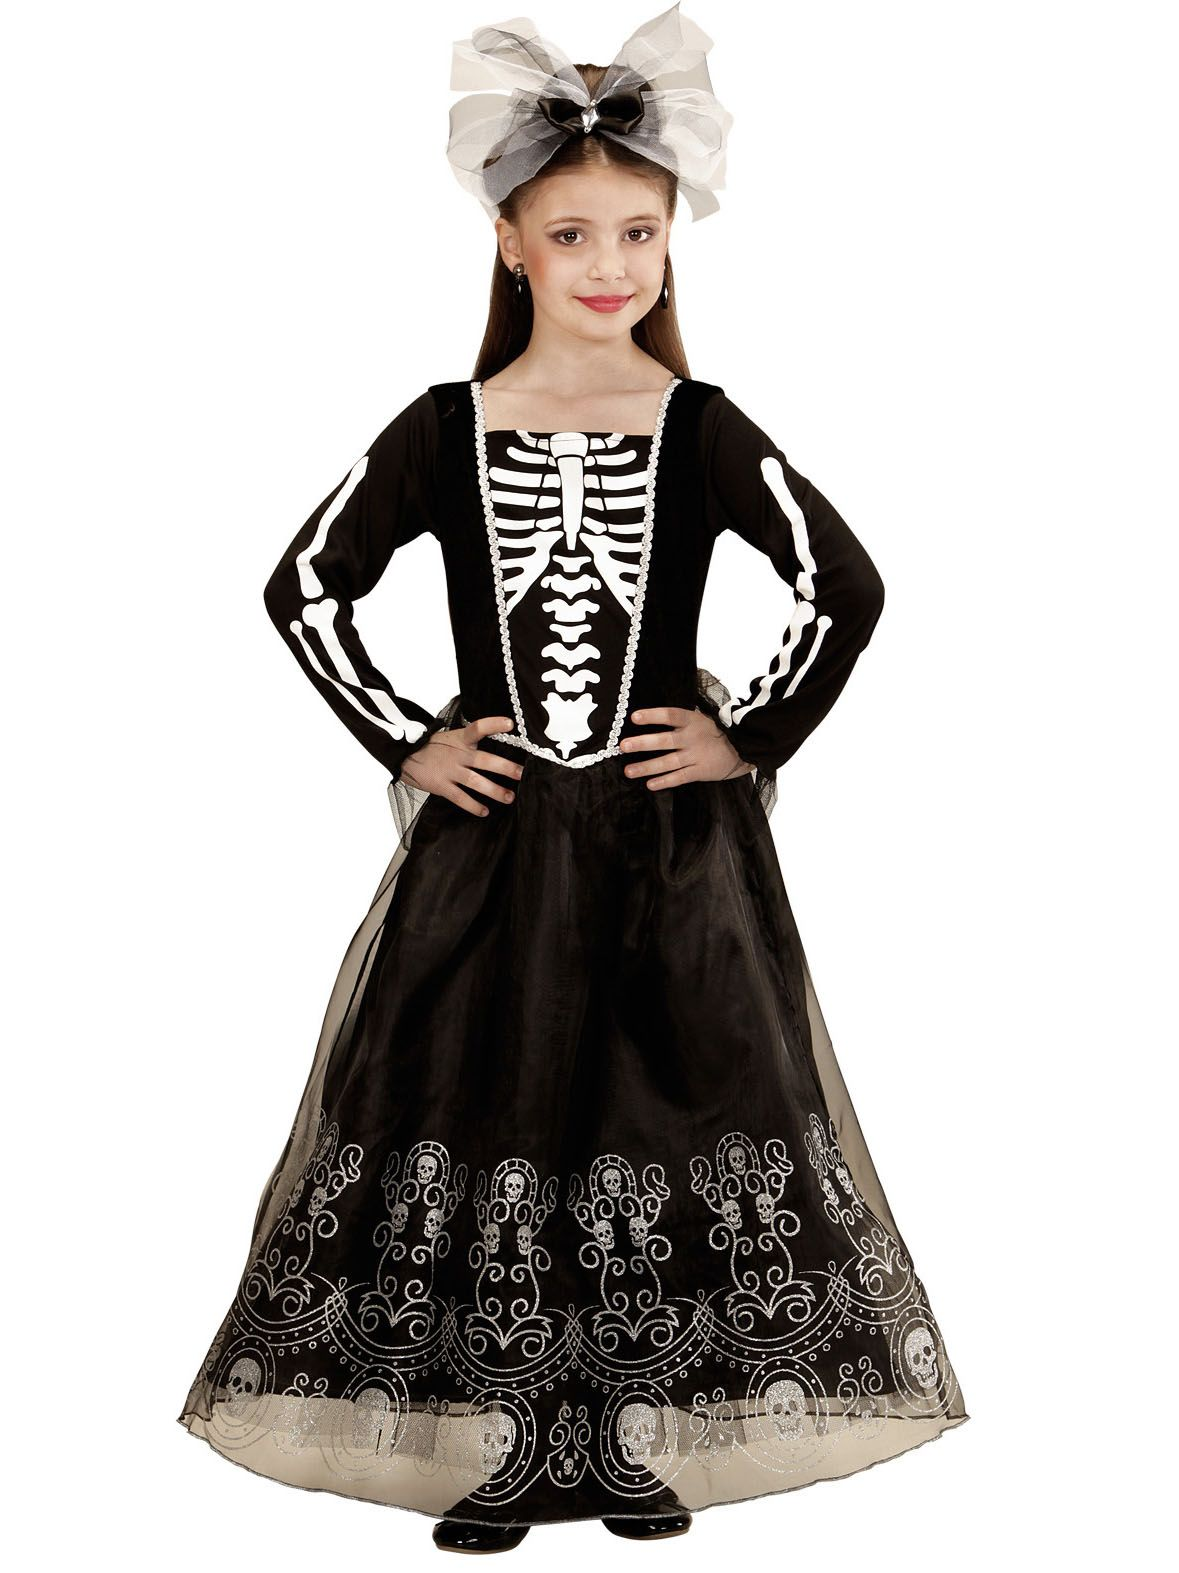 disfraz de esqueleto falda larga nia halloween este disfraz de esqueleto para nia incluye vestido